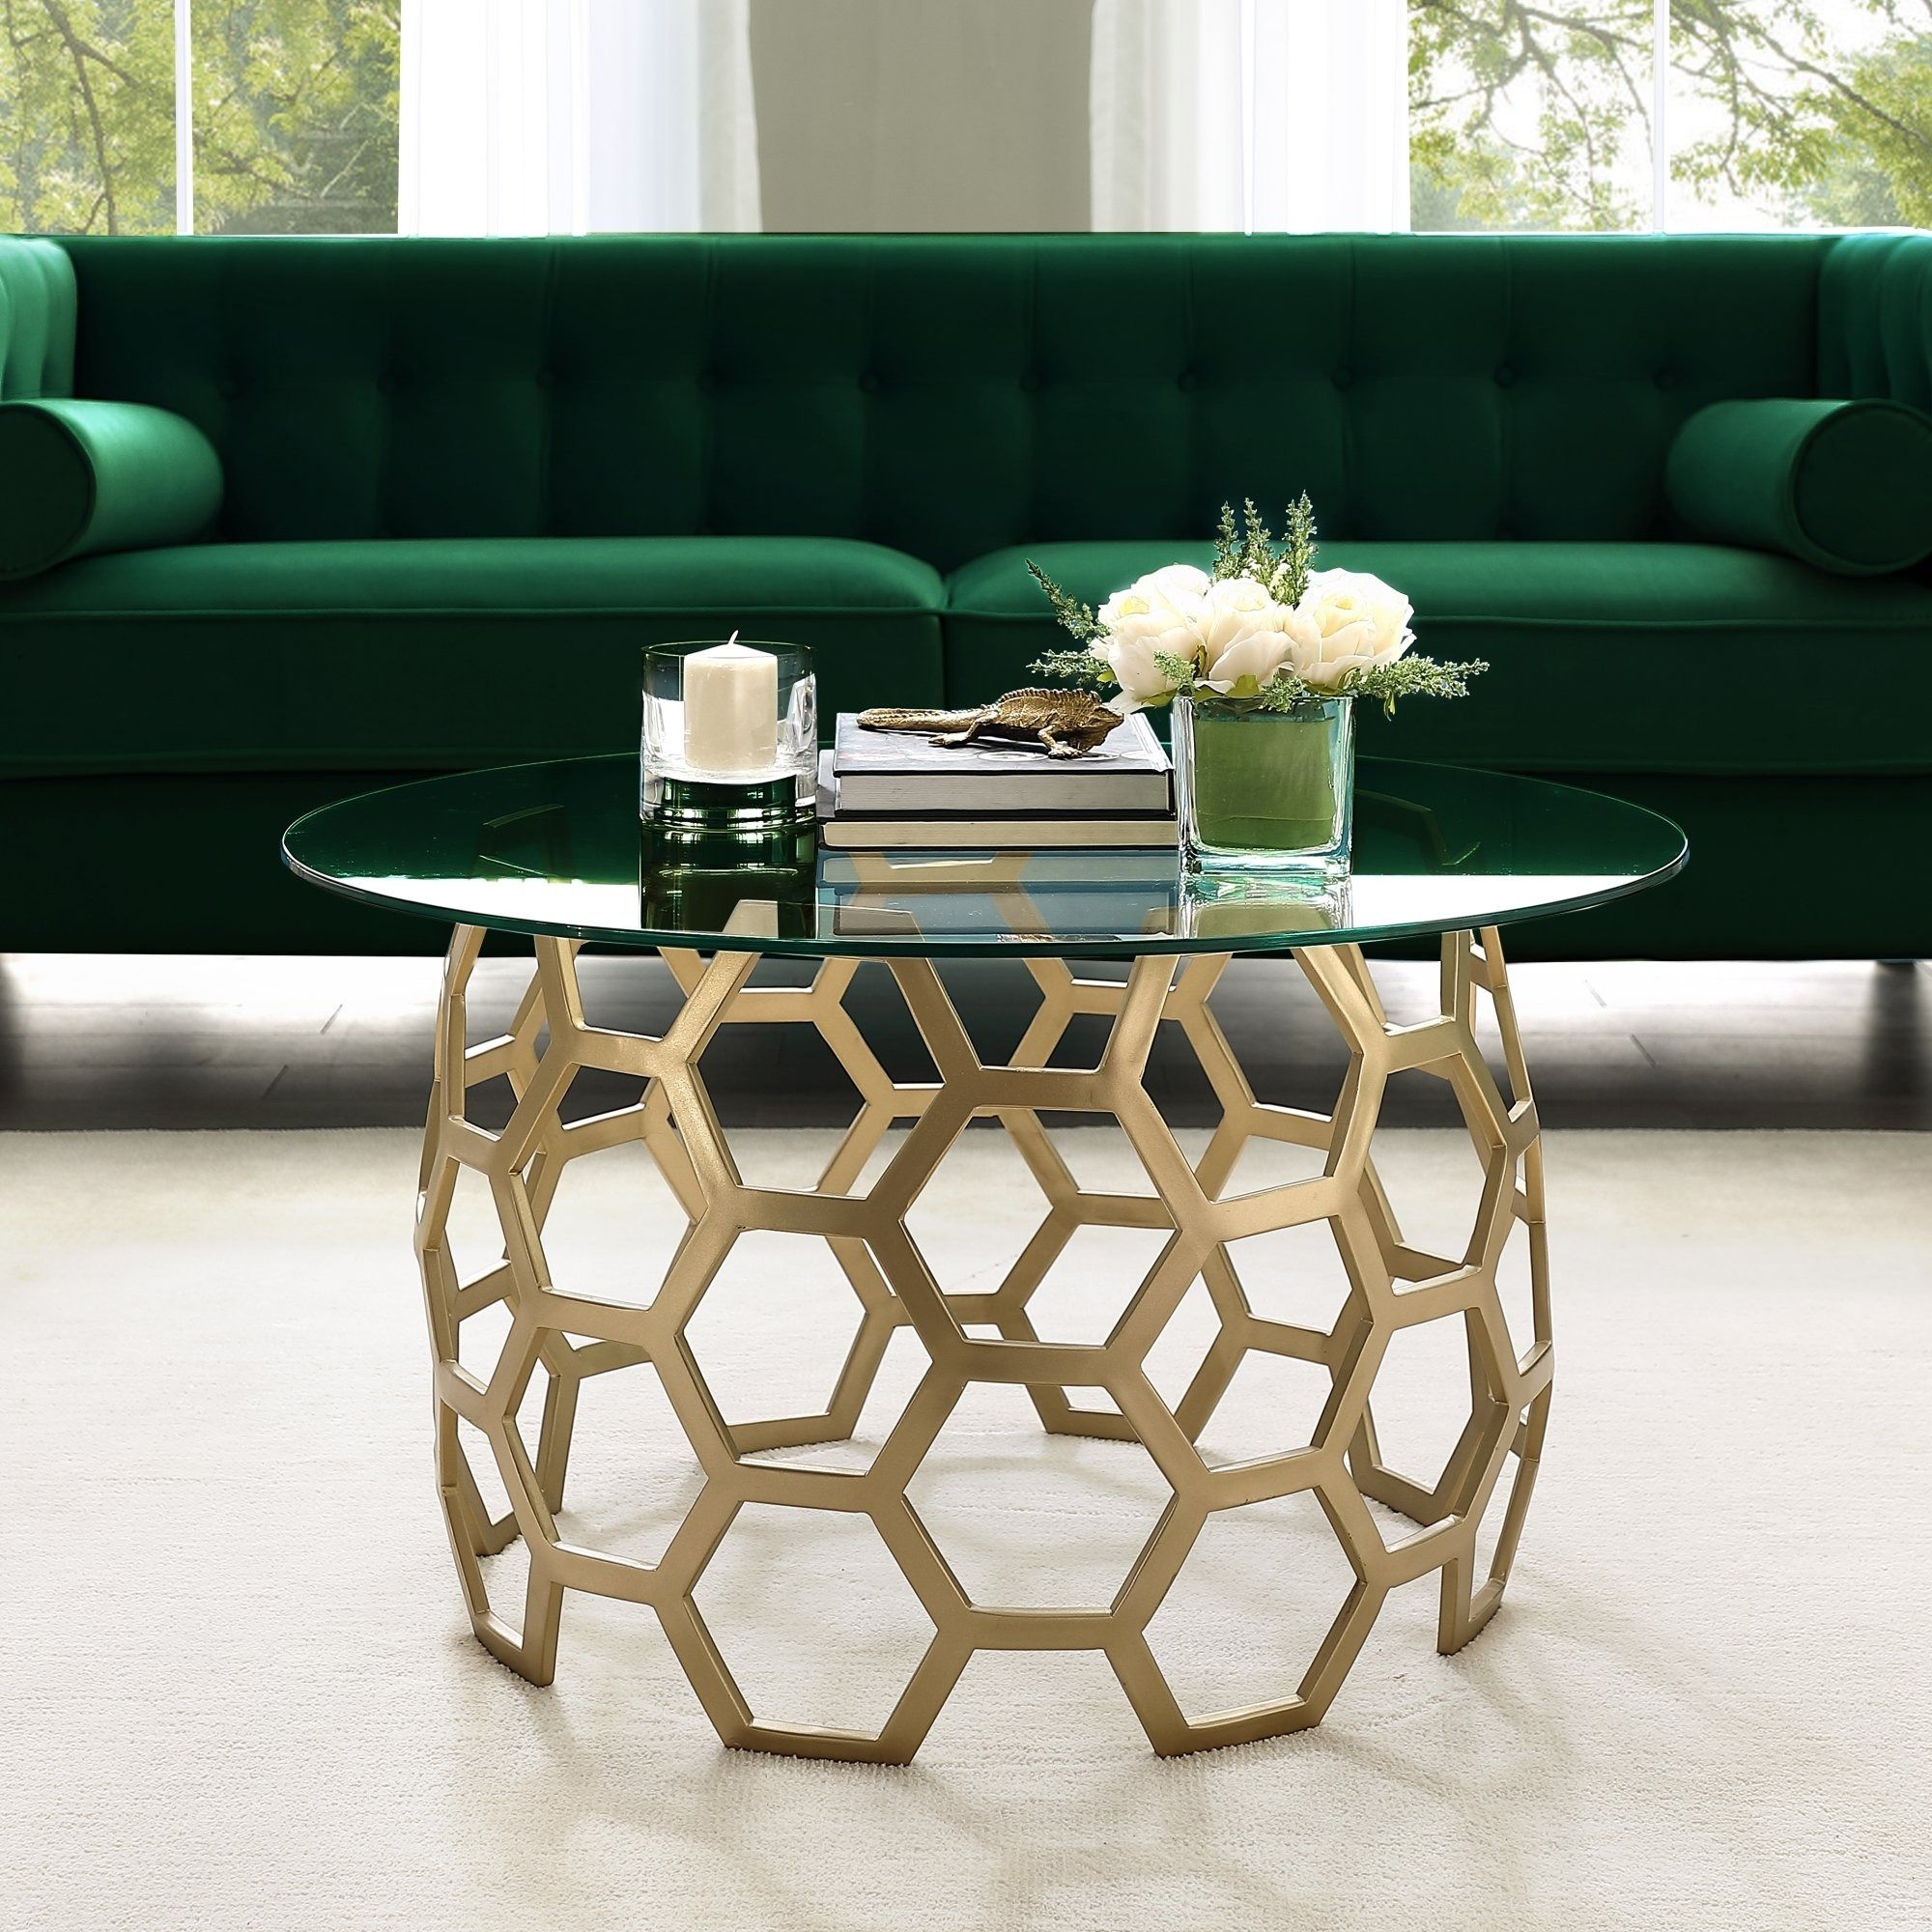 Mattea Round Top Coffee Table In 2021 Geometric Coffee Table Gold Coffee Table Silver Coffee Table [ 2000 x 2000 Pixel ]